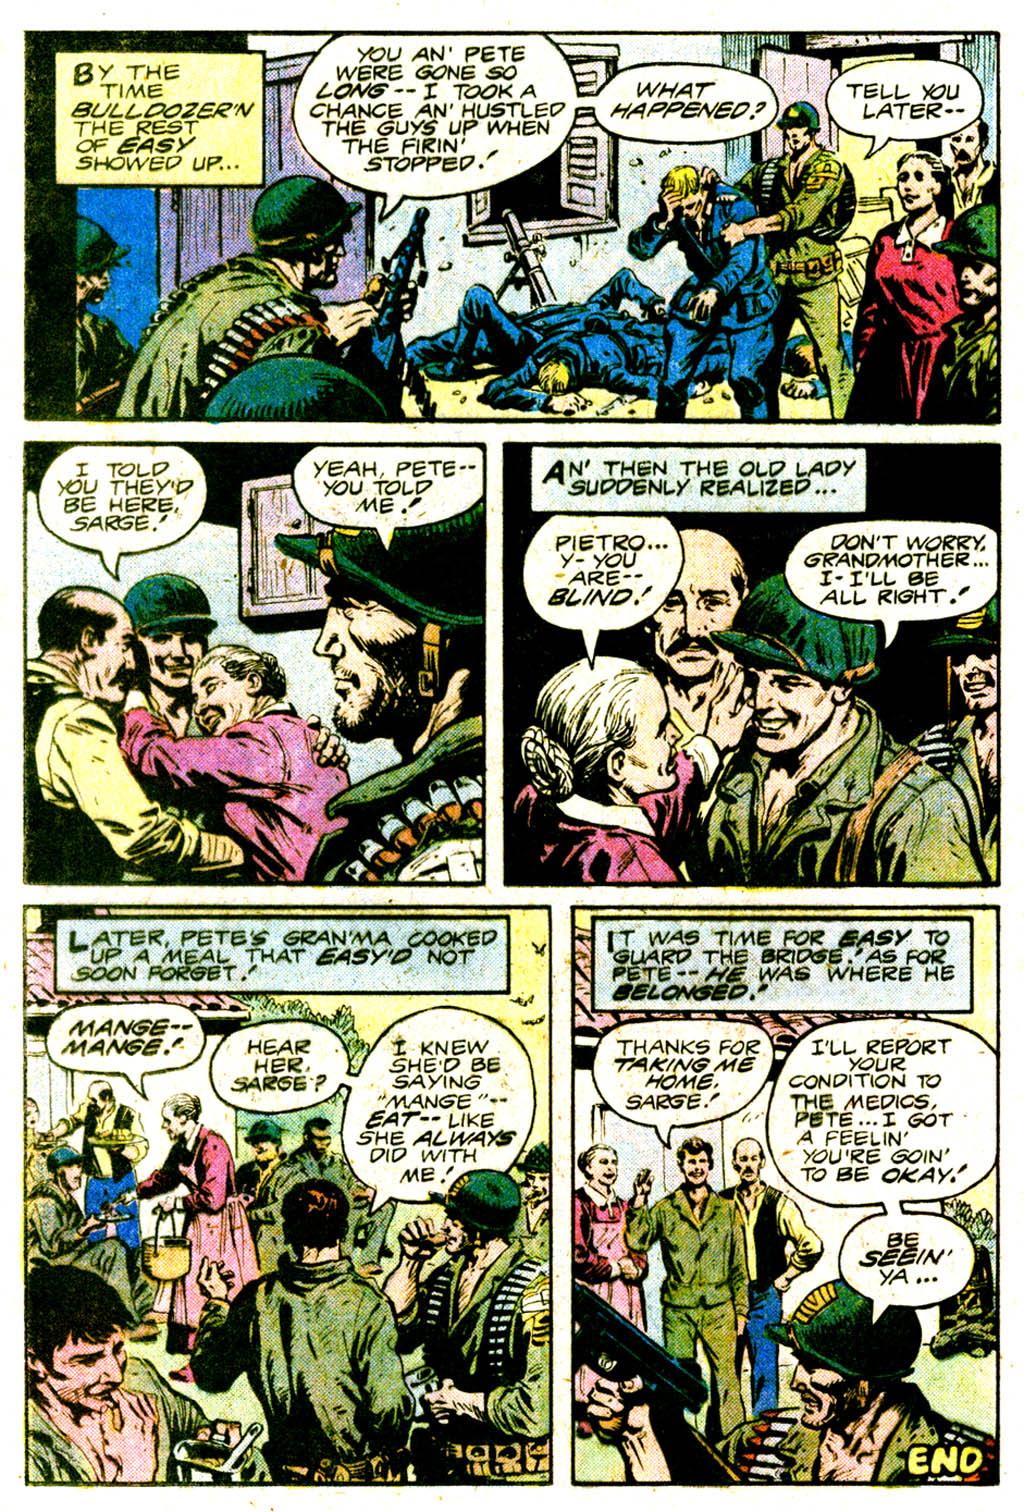 Read online Sgt. Rock comic -  Issue #364 - 19